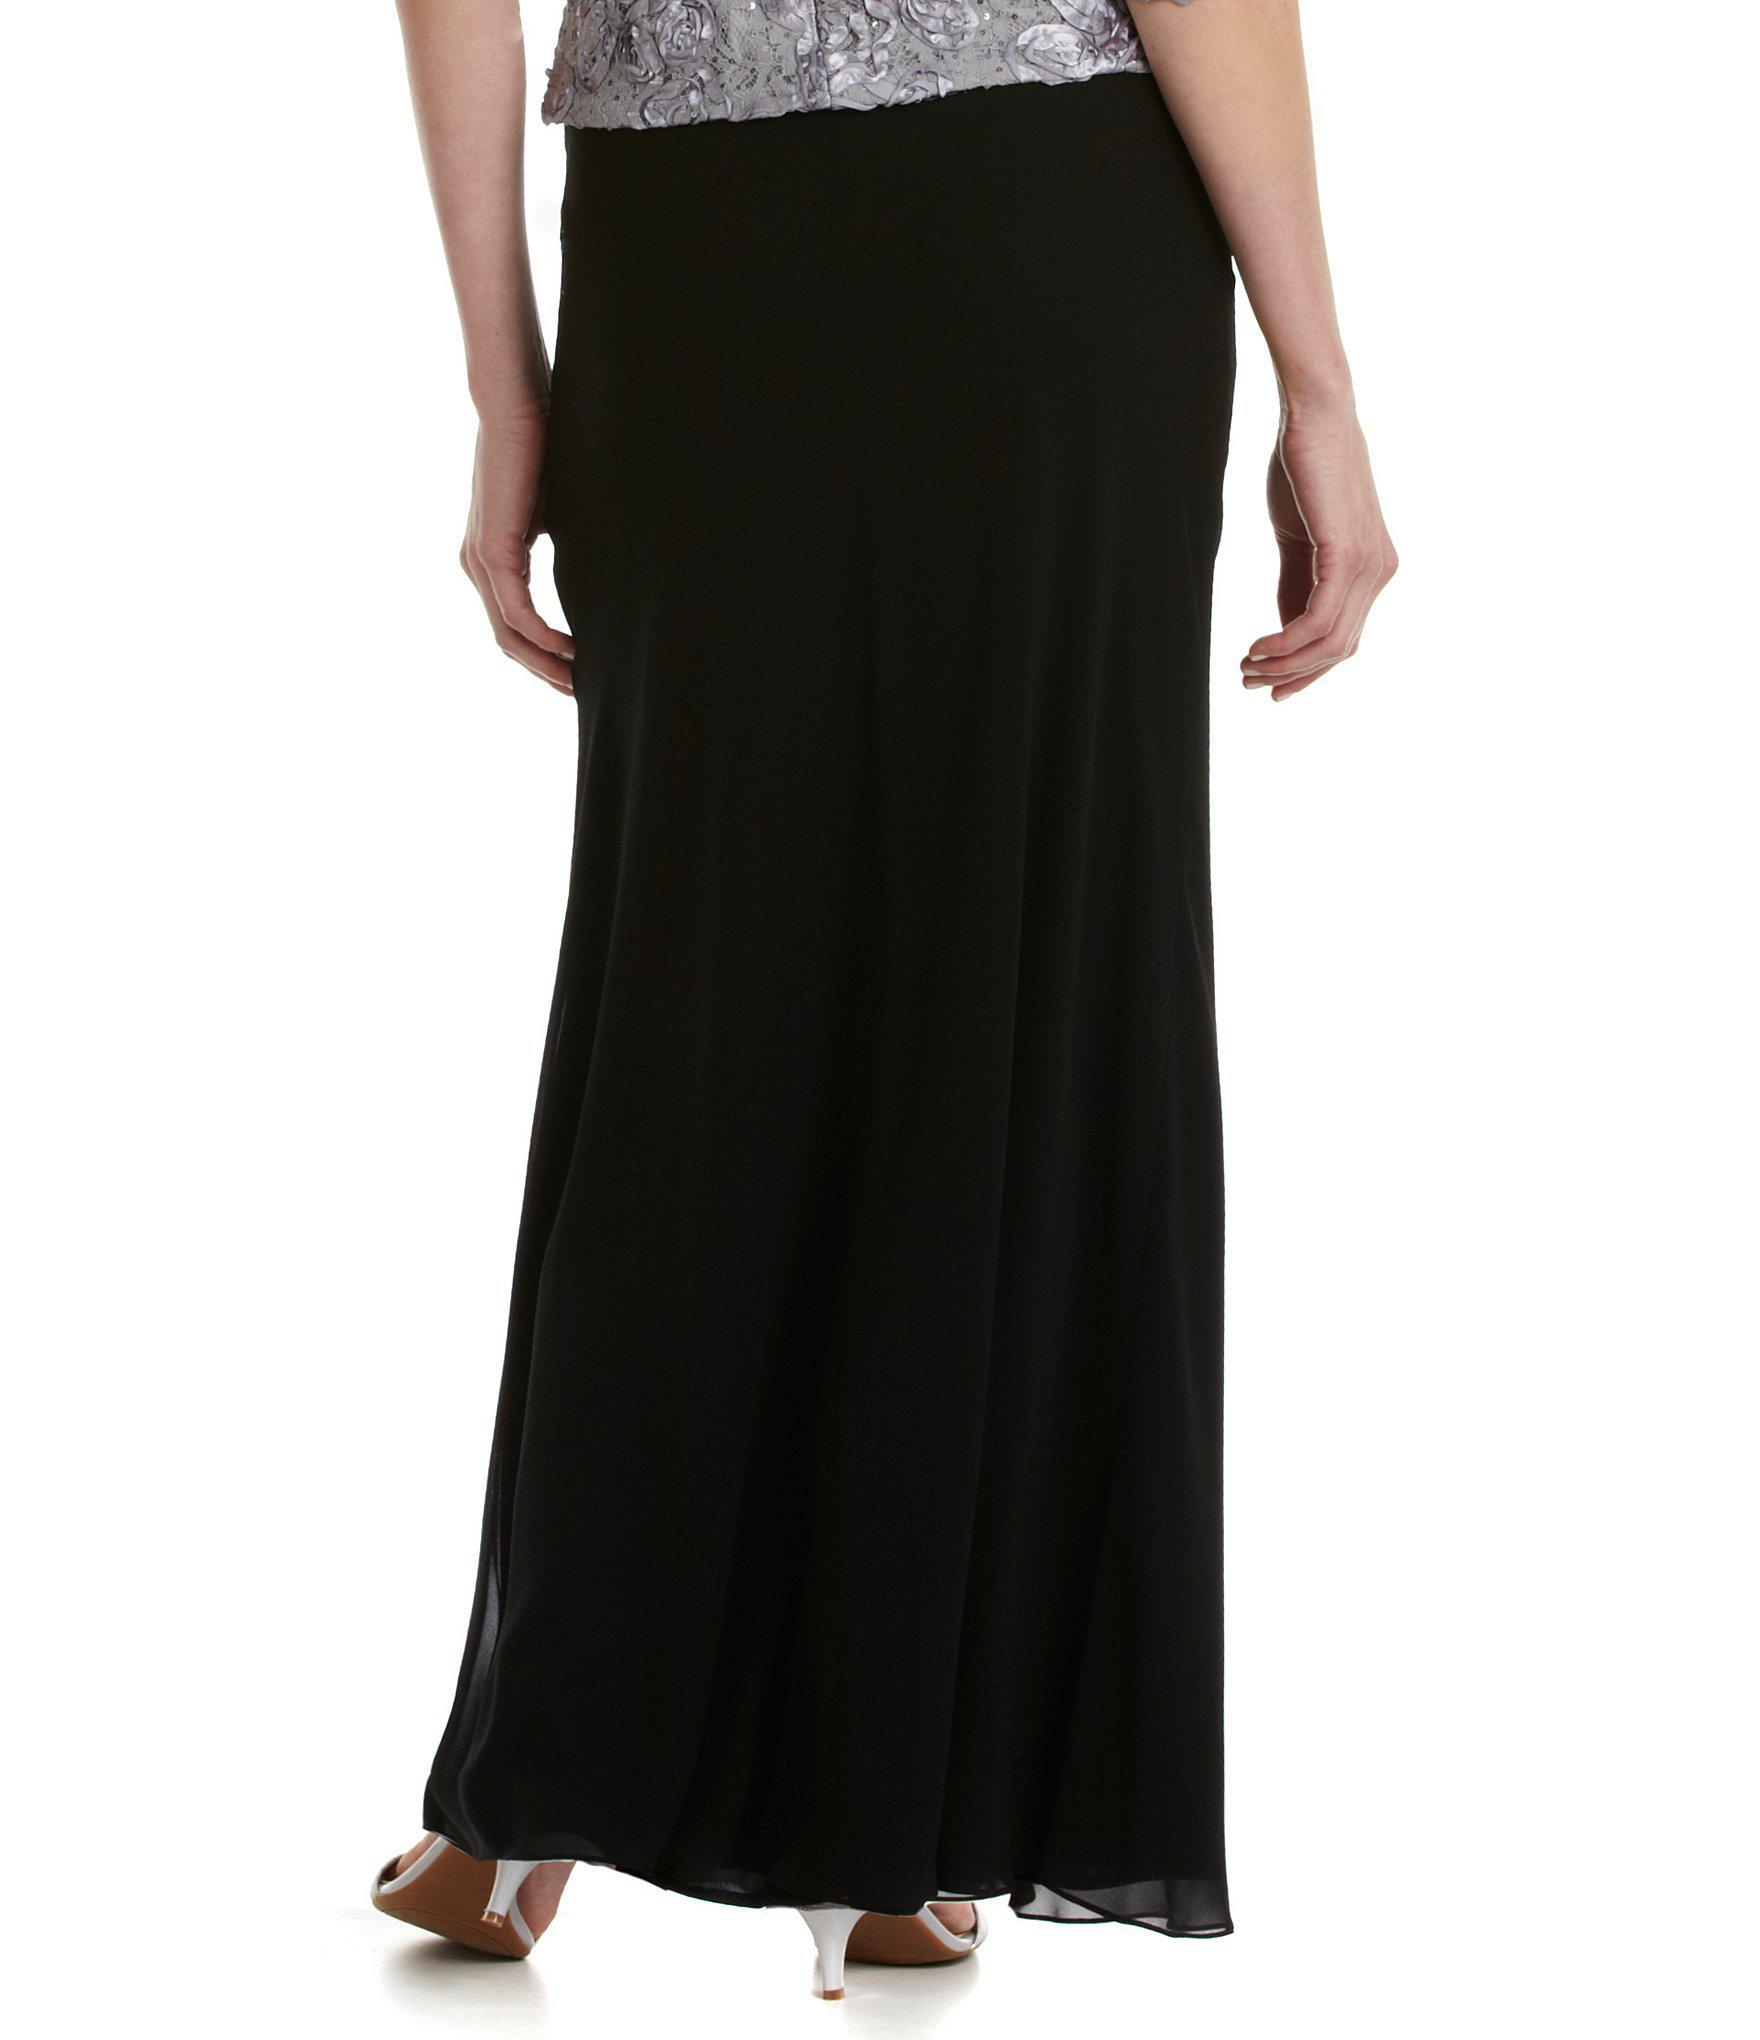 434f6dce9b Alex Evenings - Black Petite Chiffon A-line Skirt - Lyst. View fullscreen